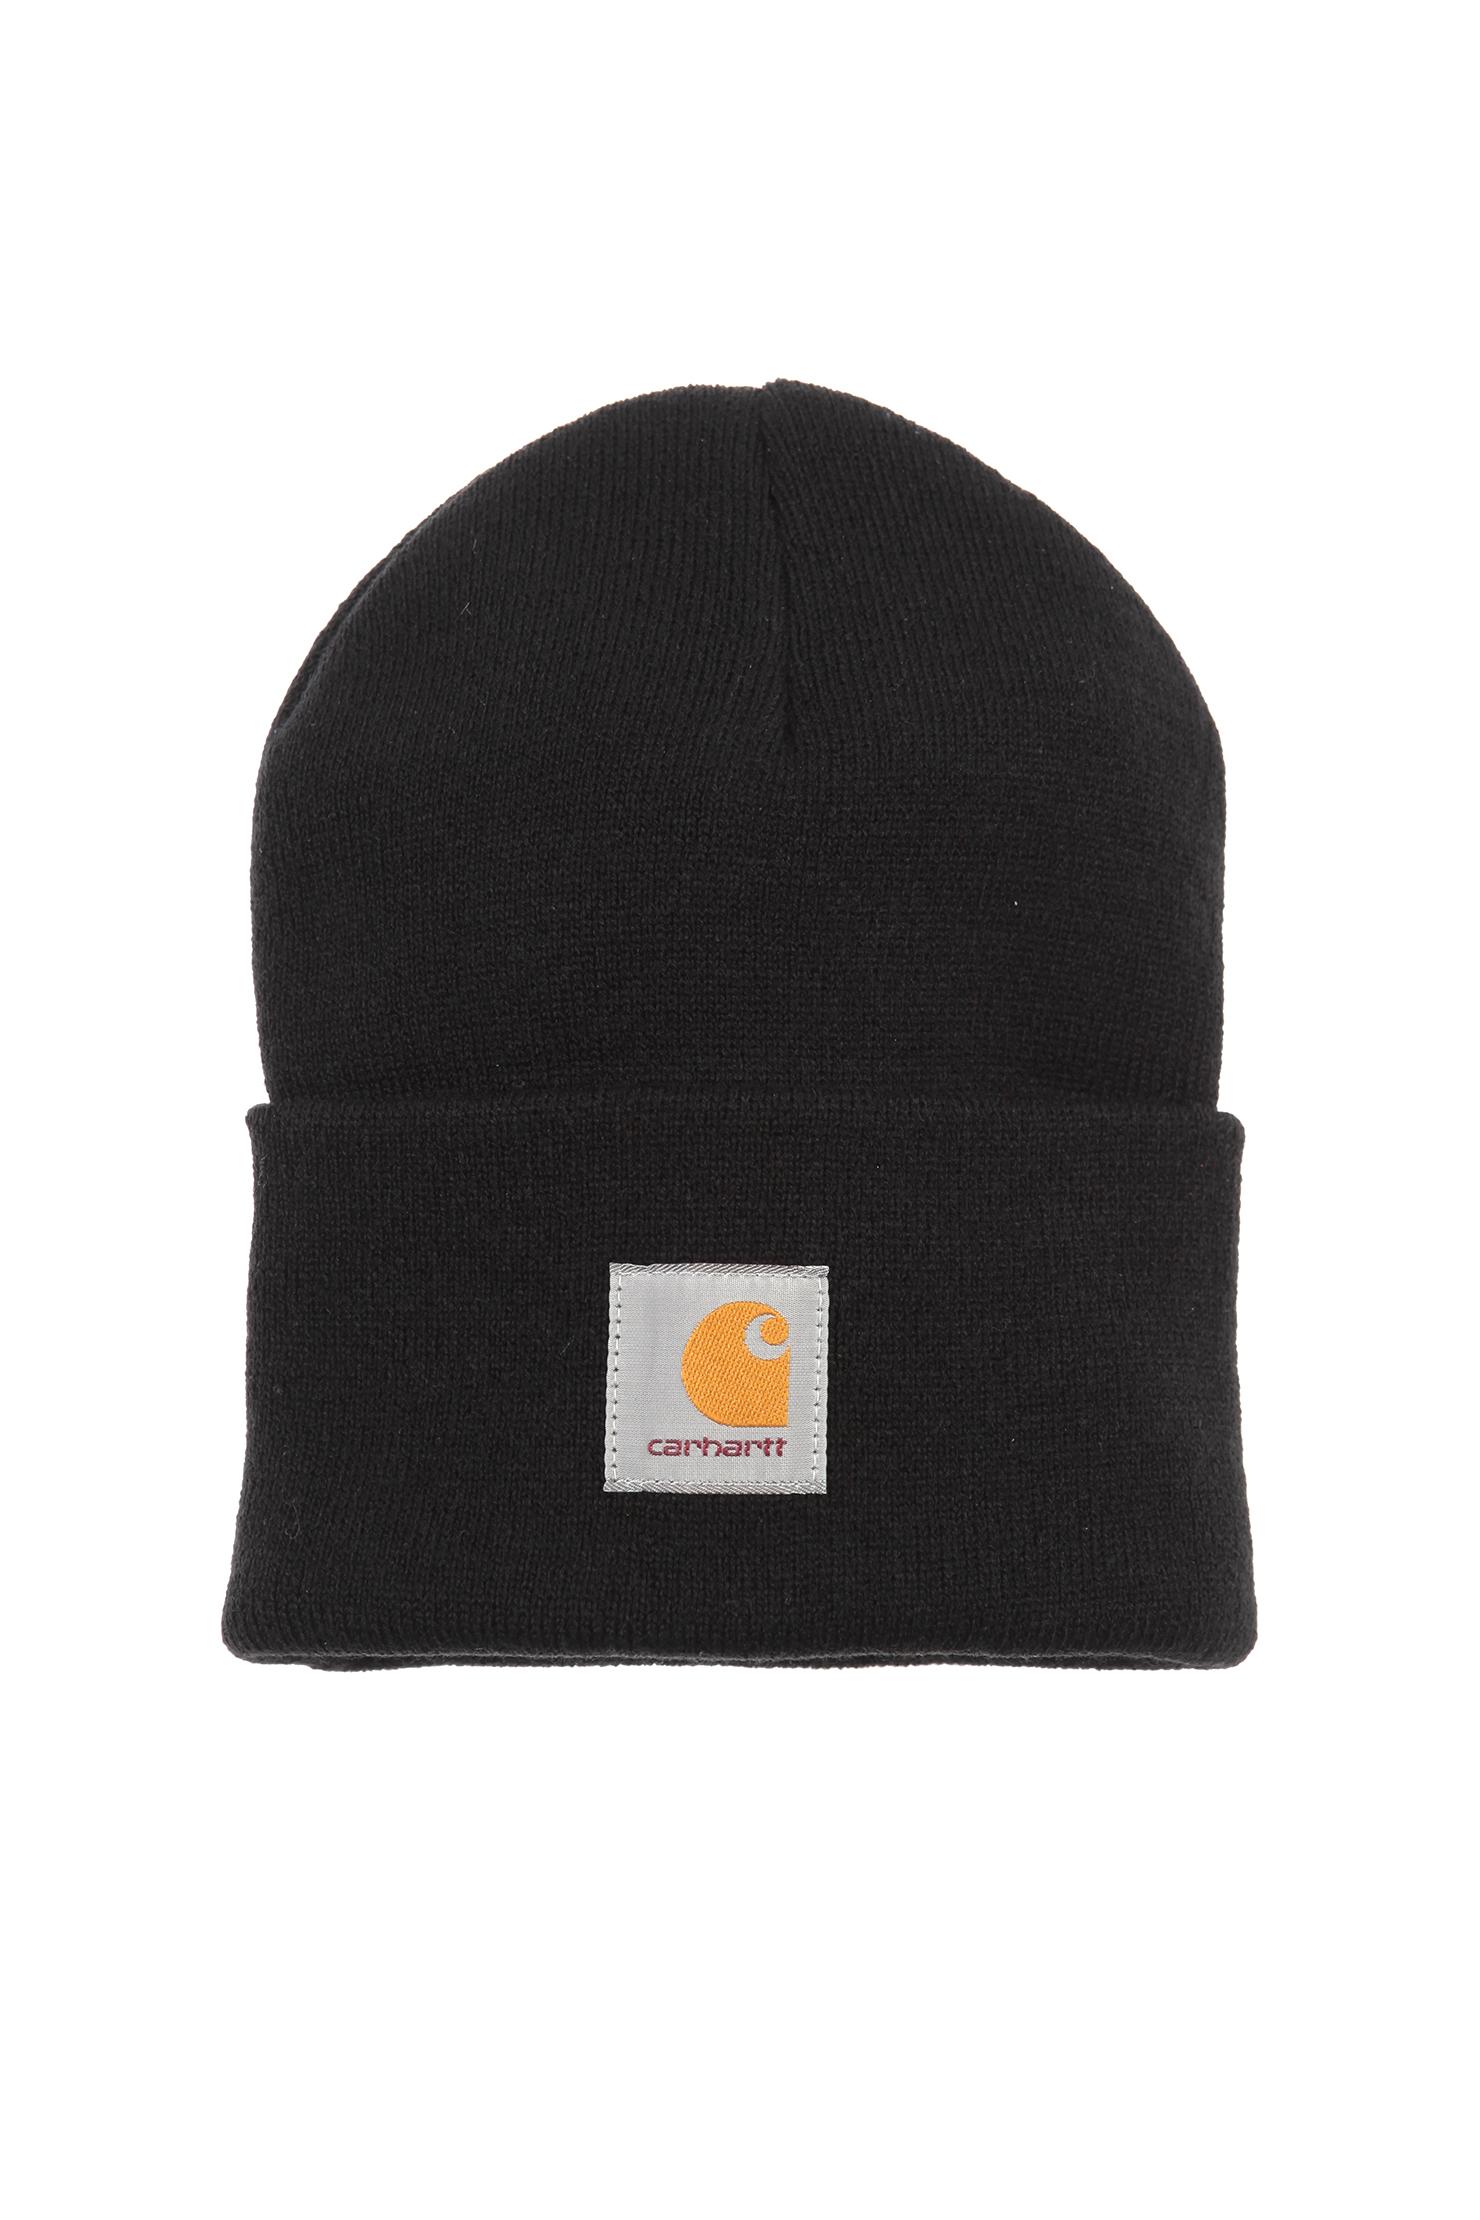 Carhartt Cap / Hat - I020222 in Black for Men | Lyst